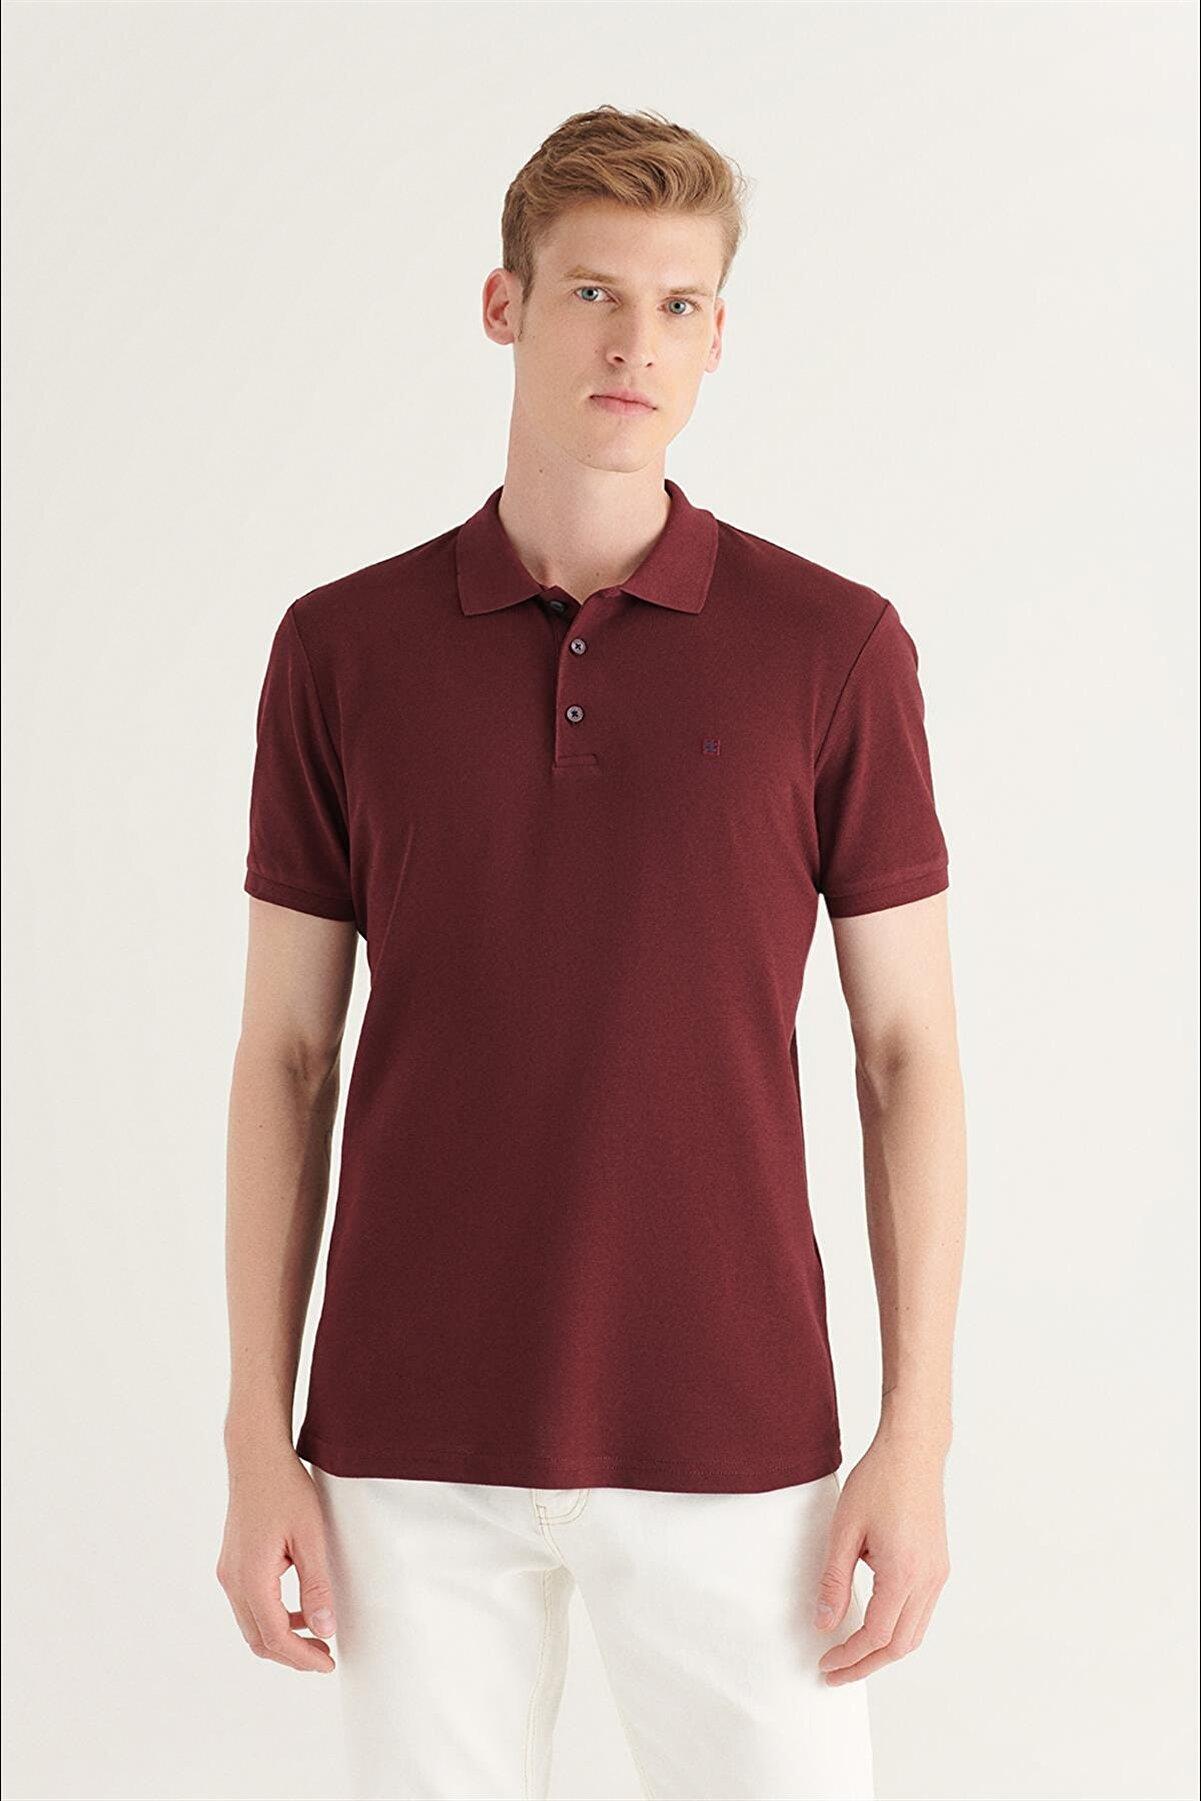 Avva Erkek Koyu Bordo Polo Yaka Düz T-shirt E001004